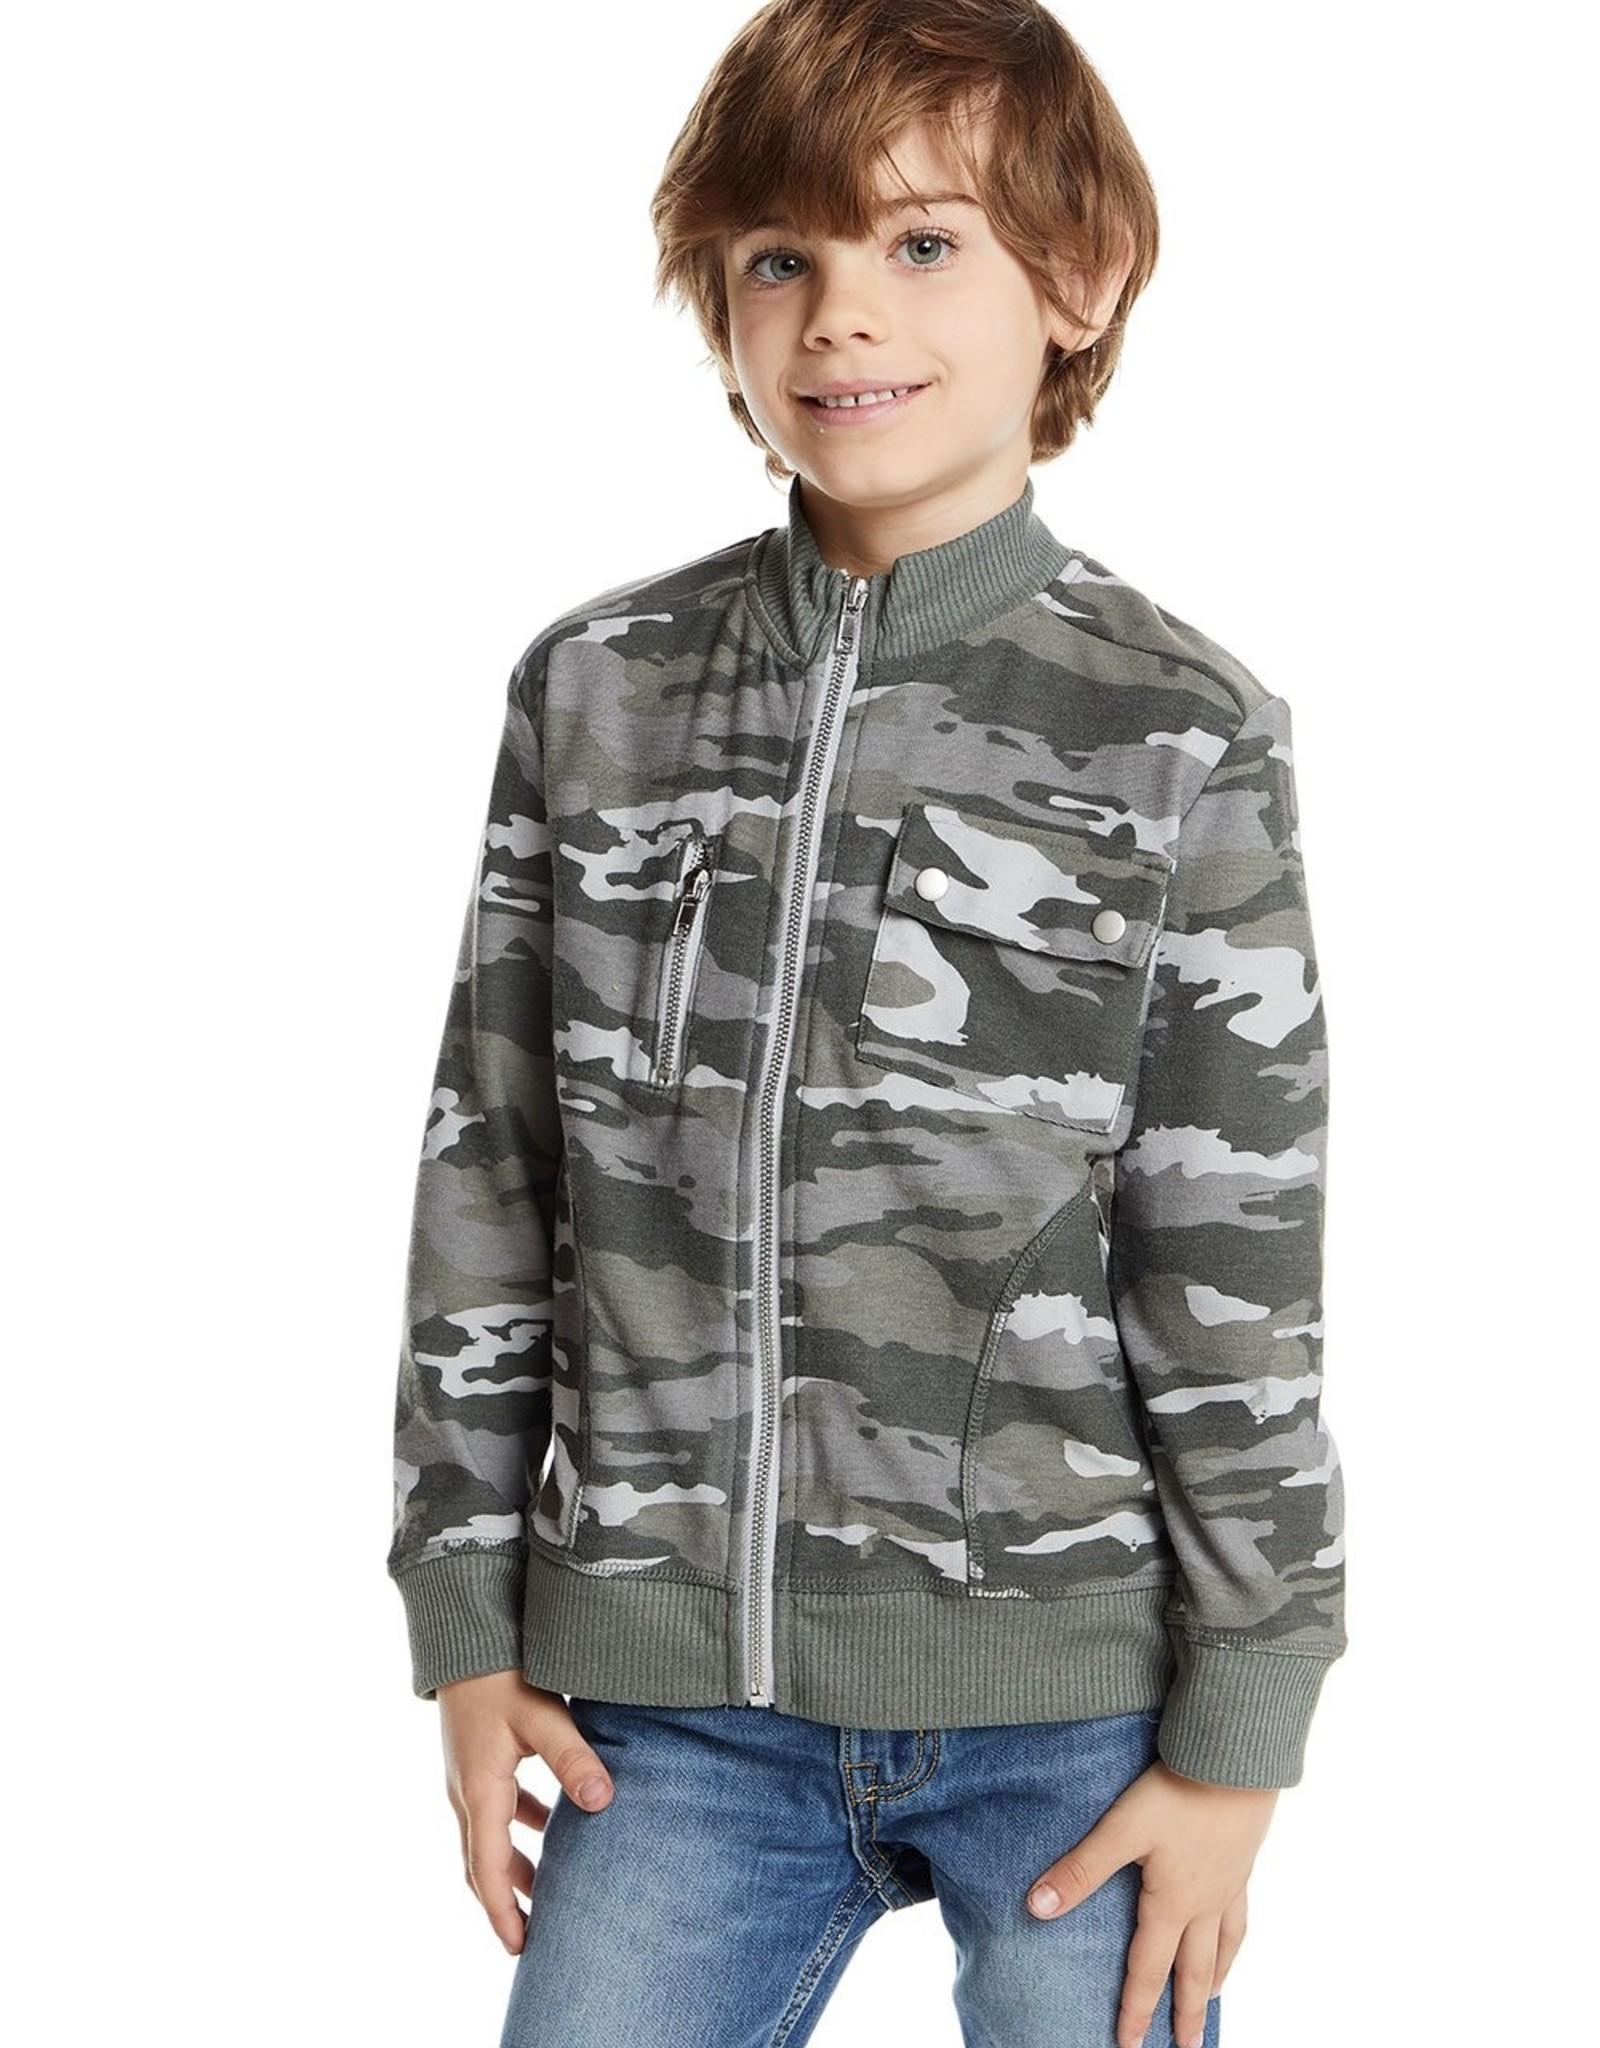 Chaser Chaser Boys Mock Neck Zip Jacket